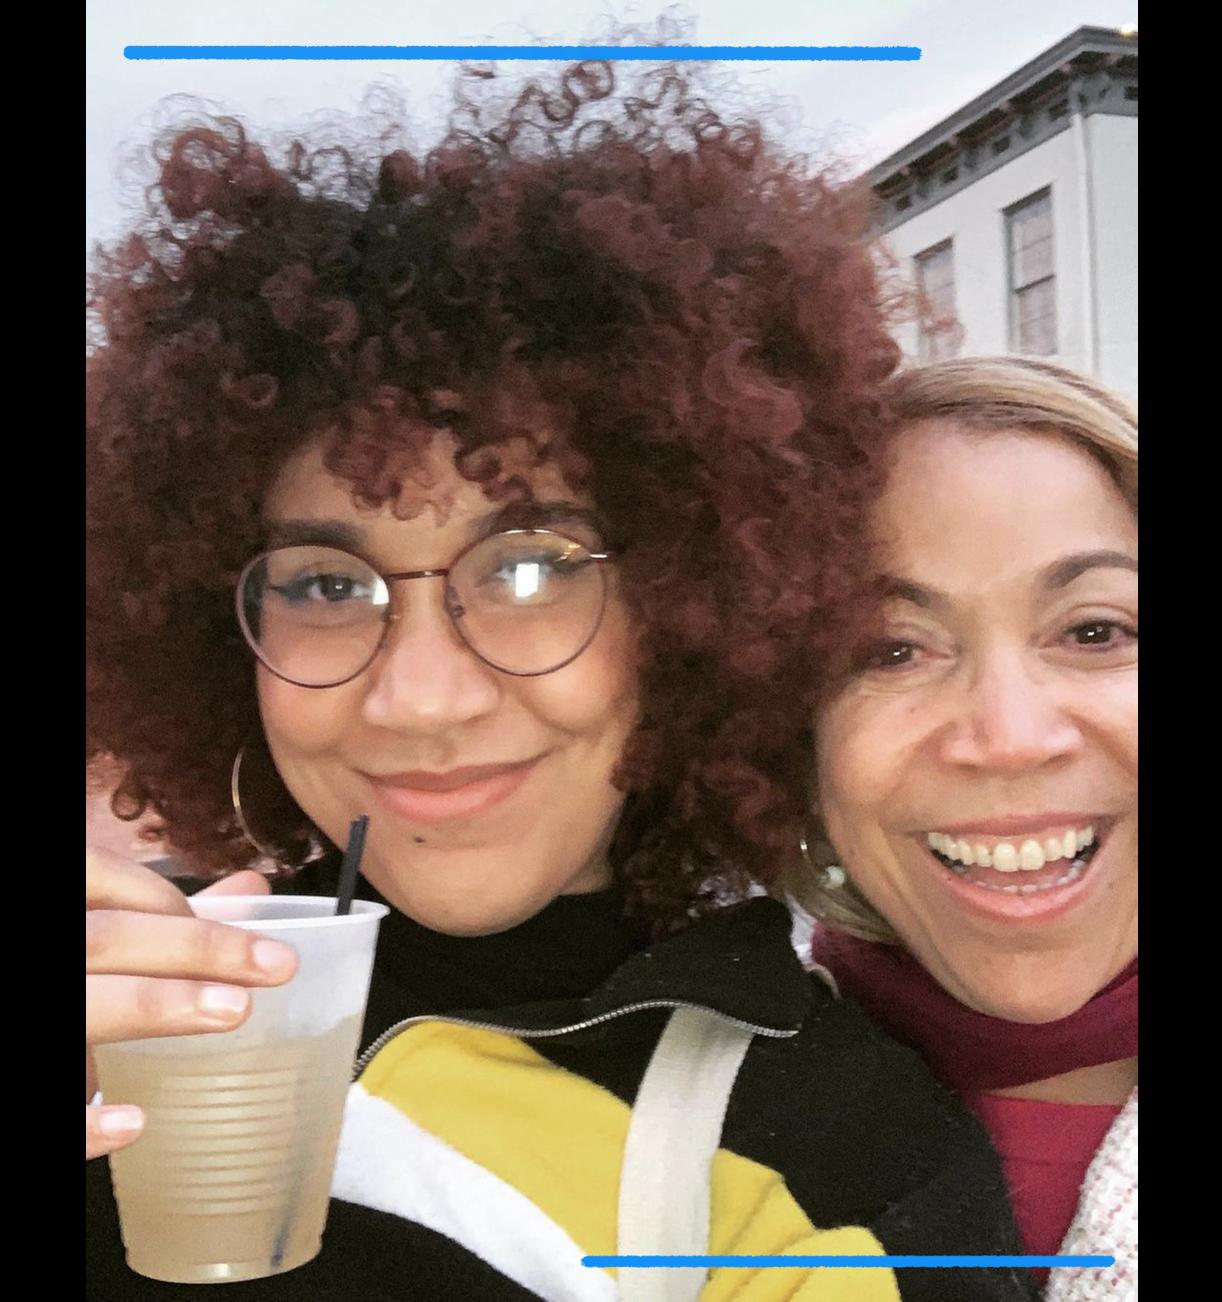 Jennessy Herrera, left, and Evelyn Herrera in Savannah, Ga., in 2019. (Family photo)